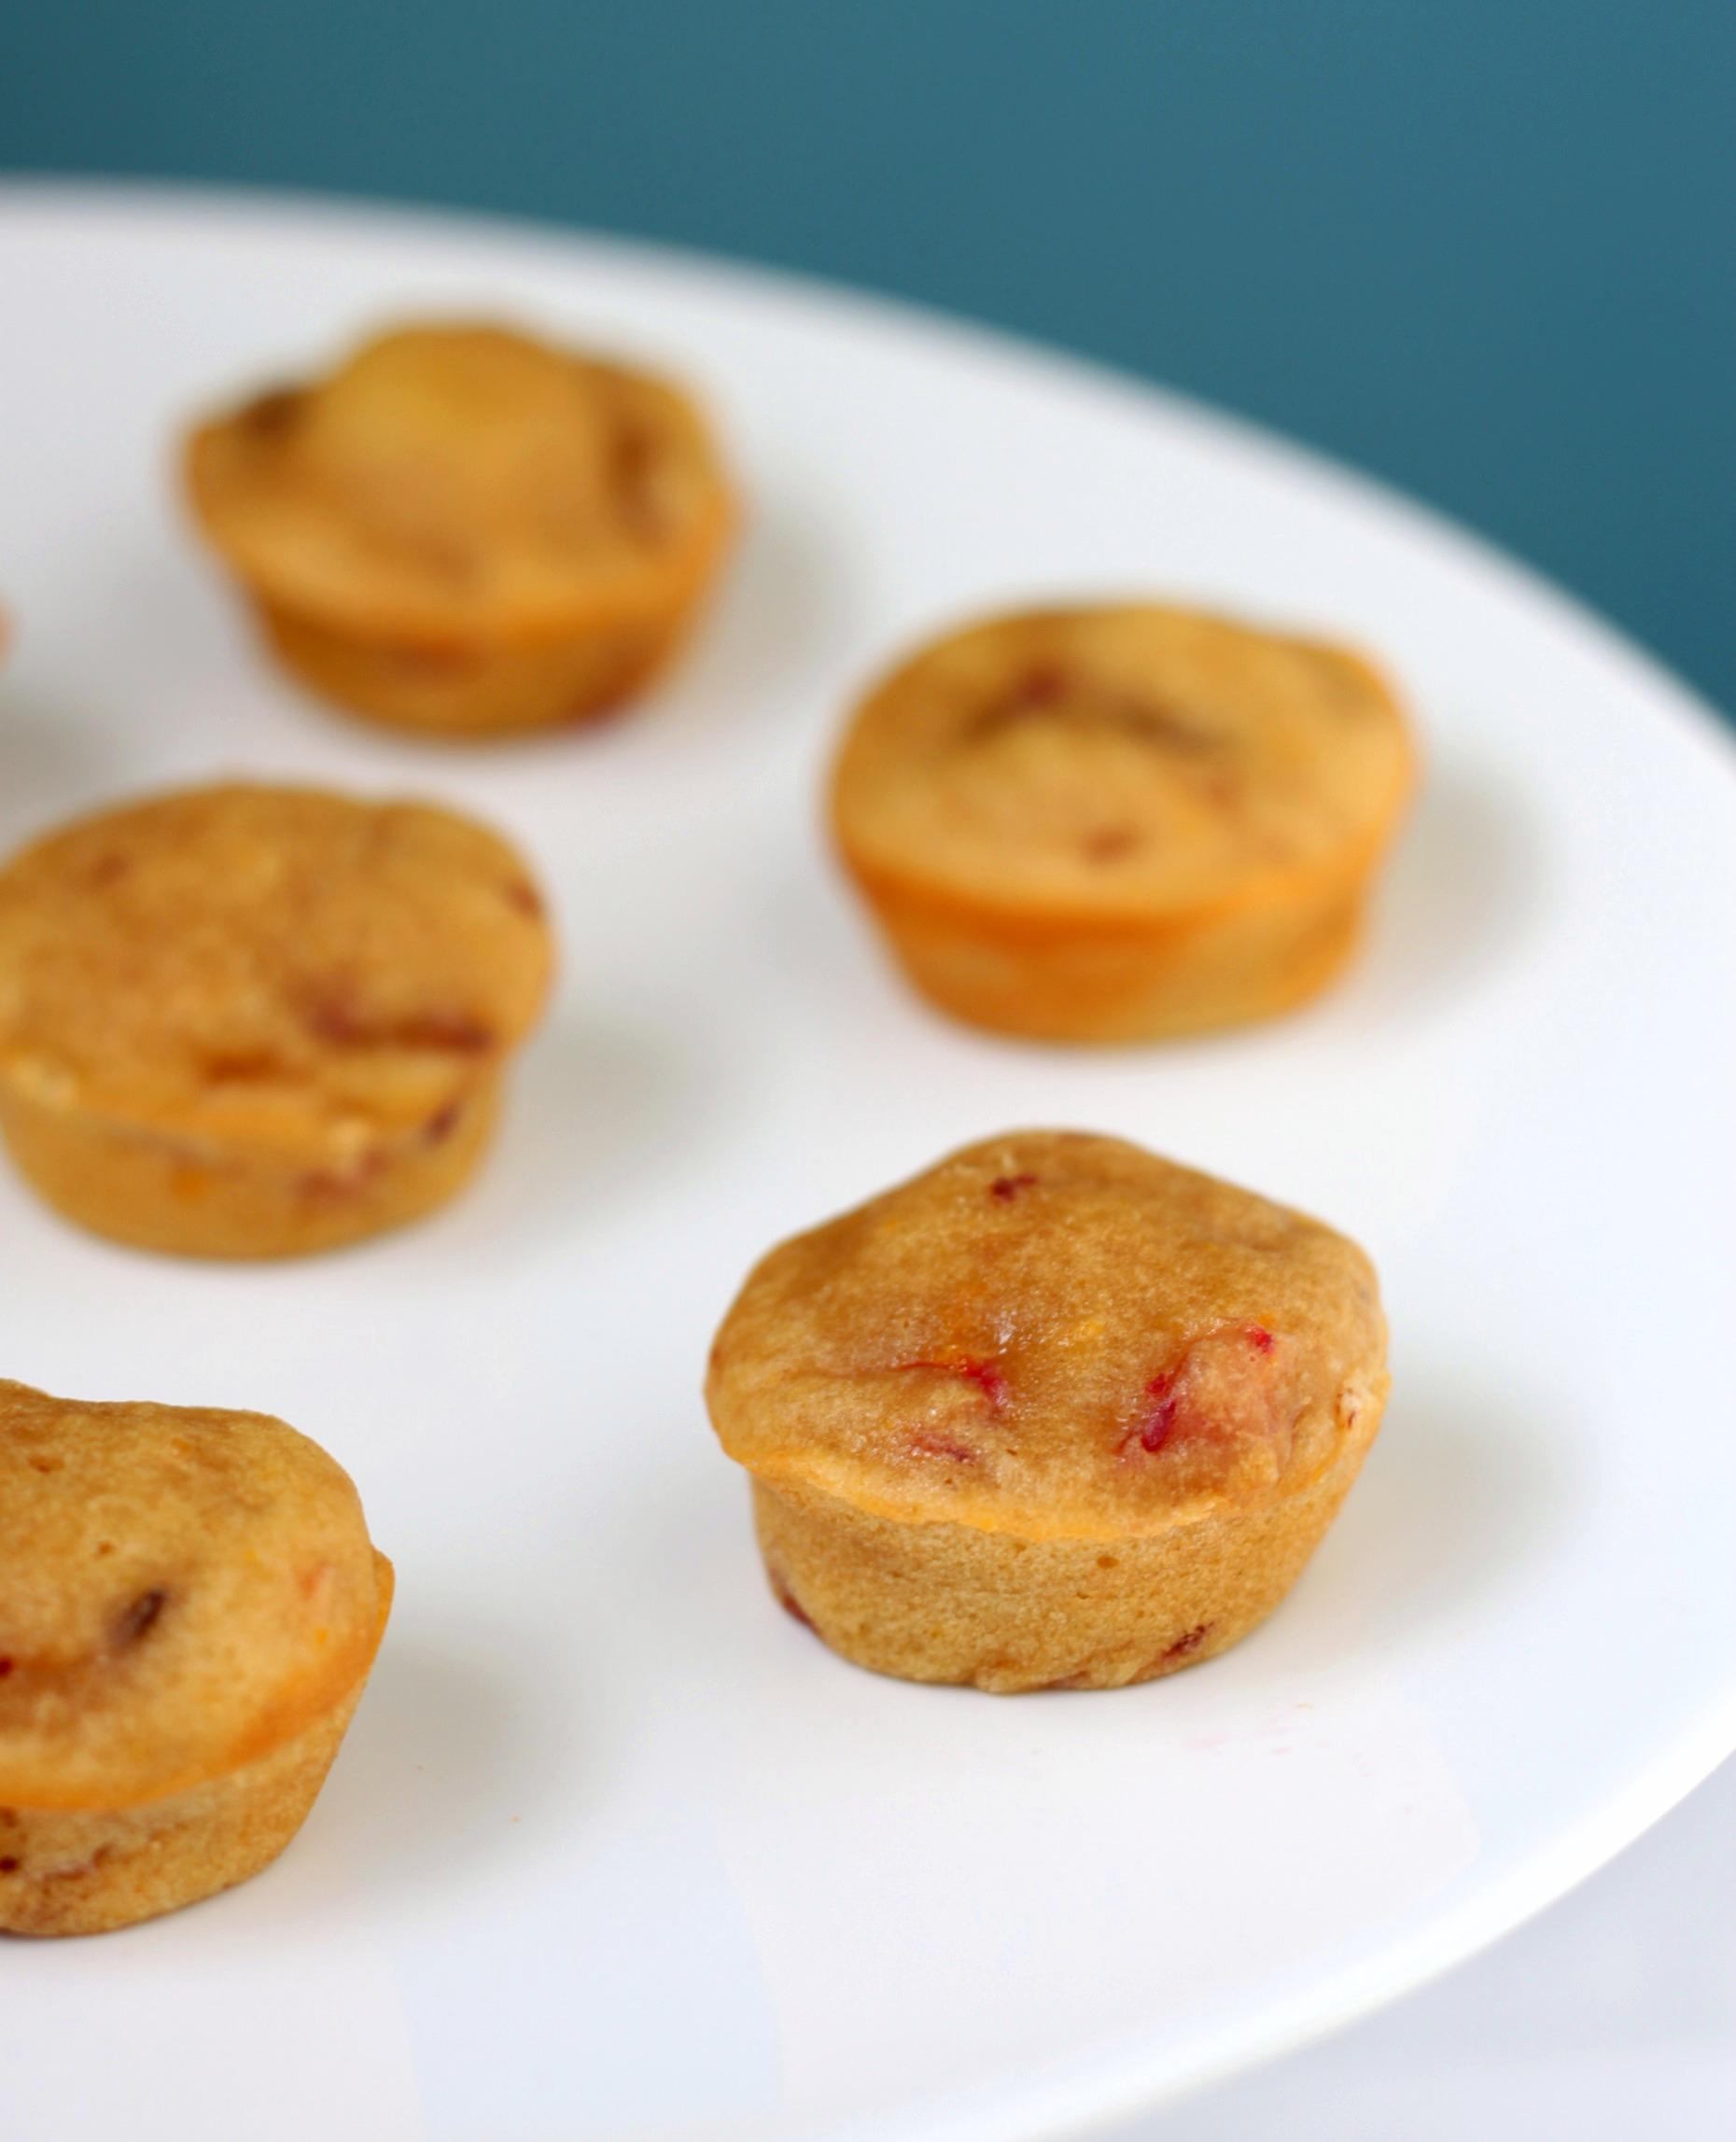 Blood orange mini muffins